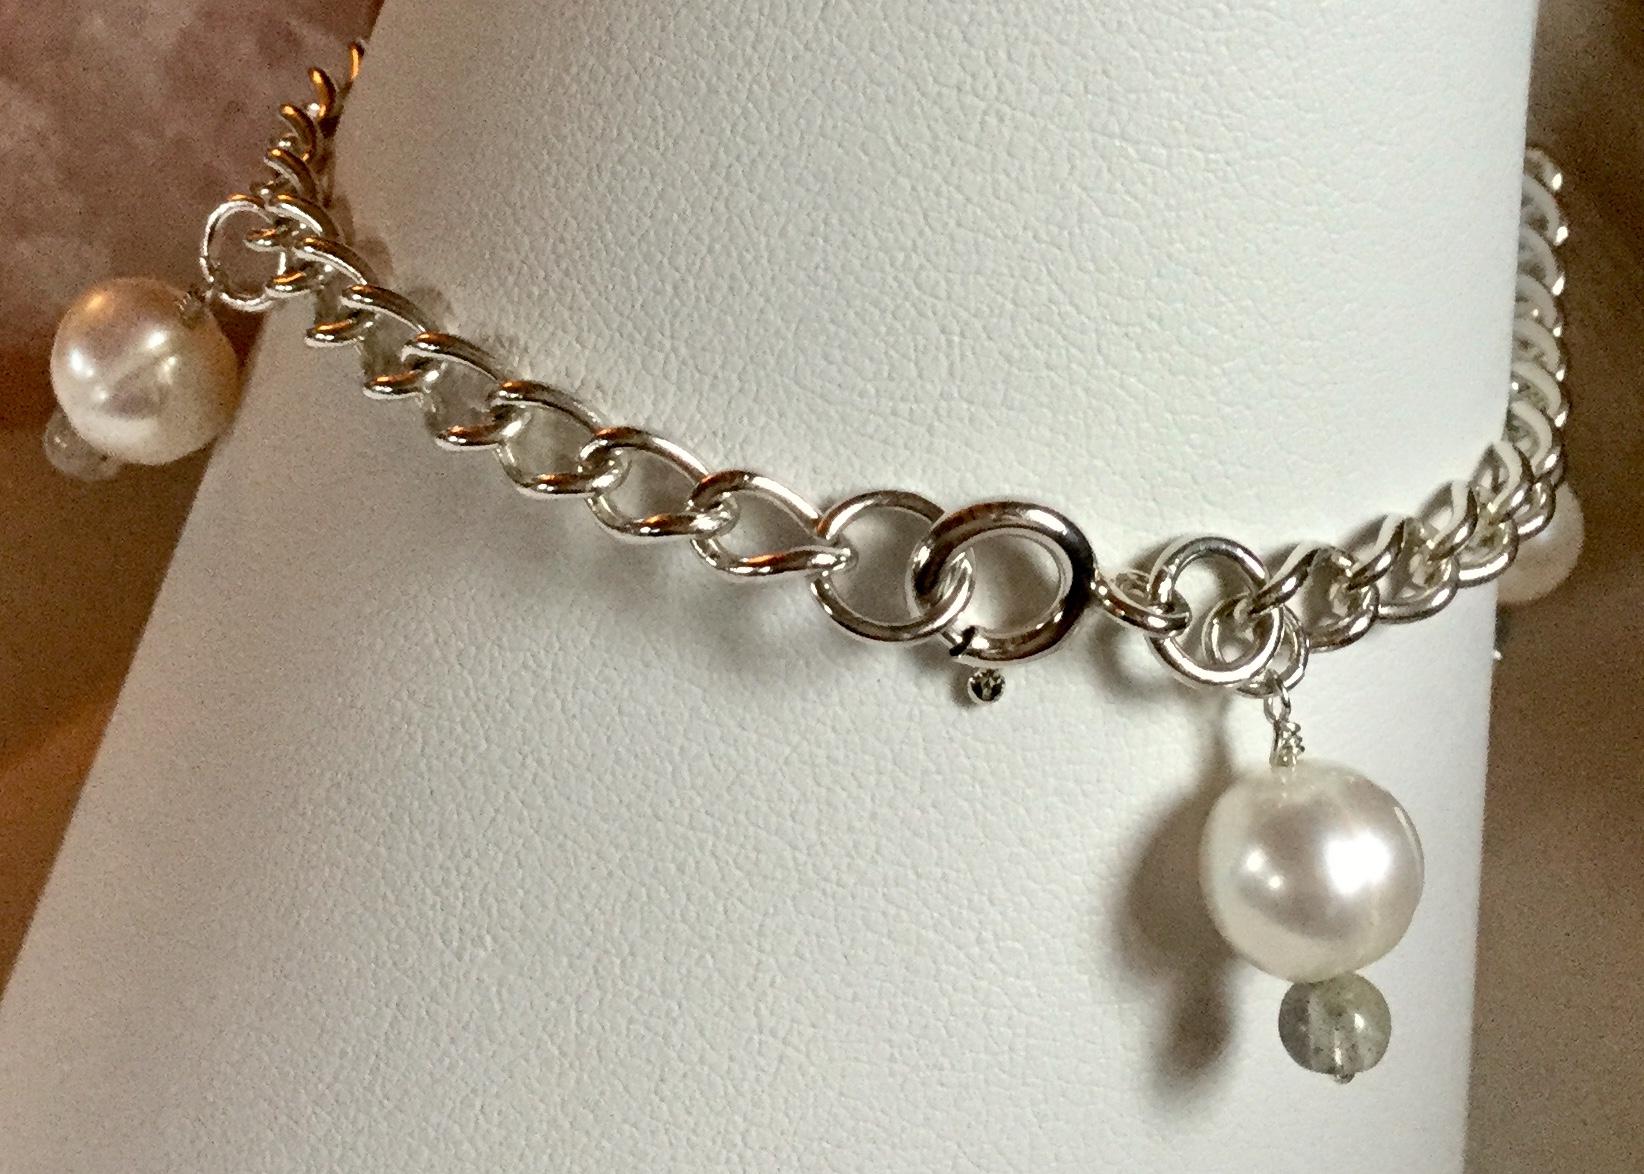 Lot 12 - Vintage 925 Silver Bracelet charm of Freshwater Cultured Pearl Labradorite charm